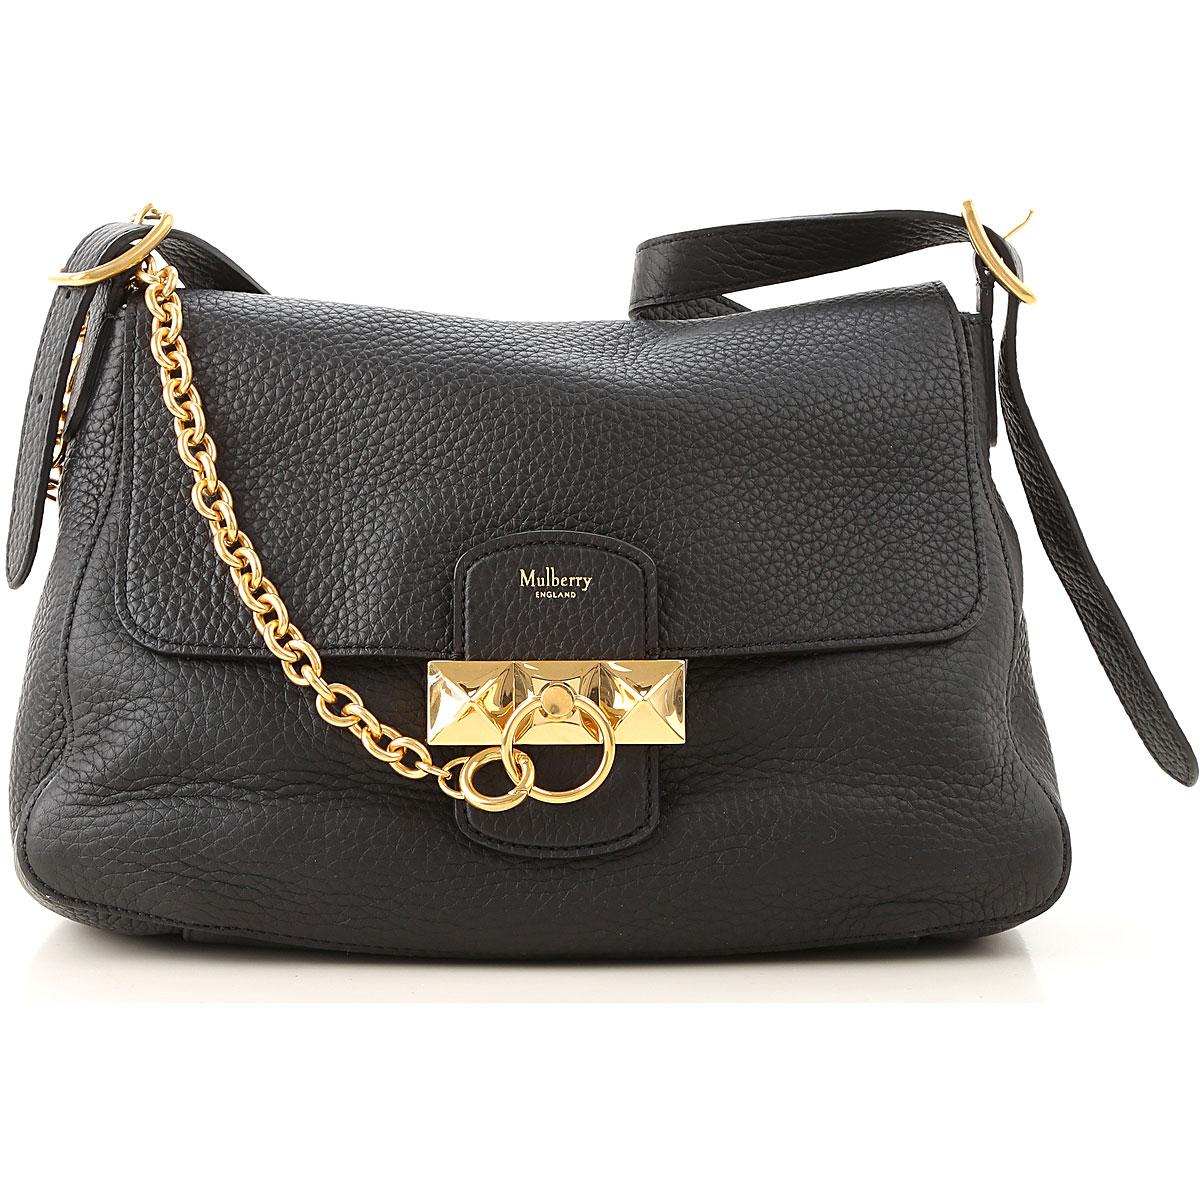 Mulberry Top Handle Handbag On Sale, Black, Leather, 2019